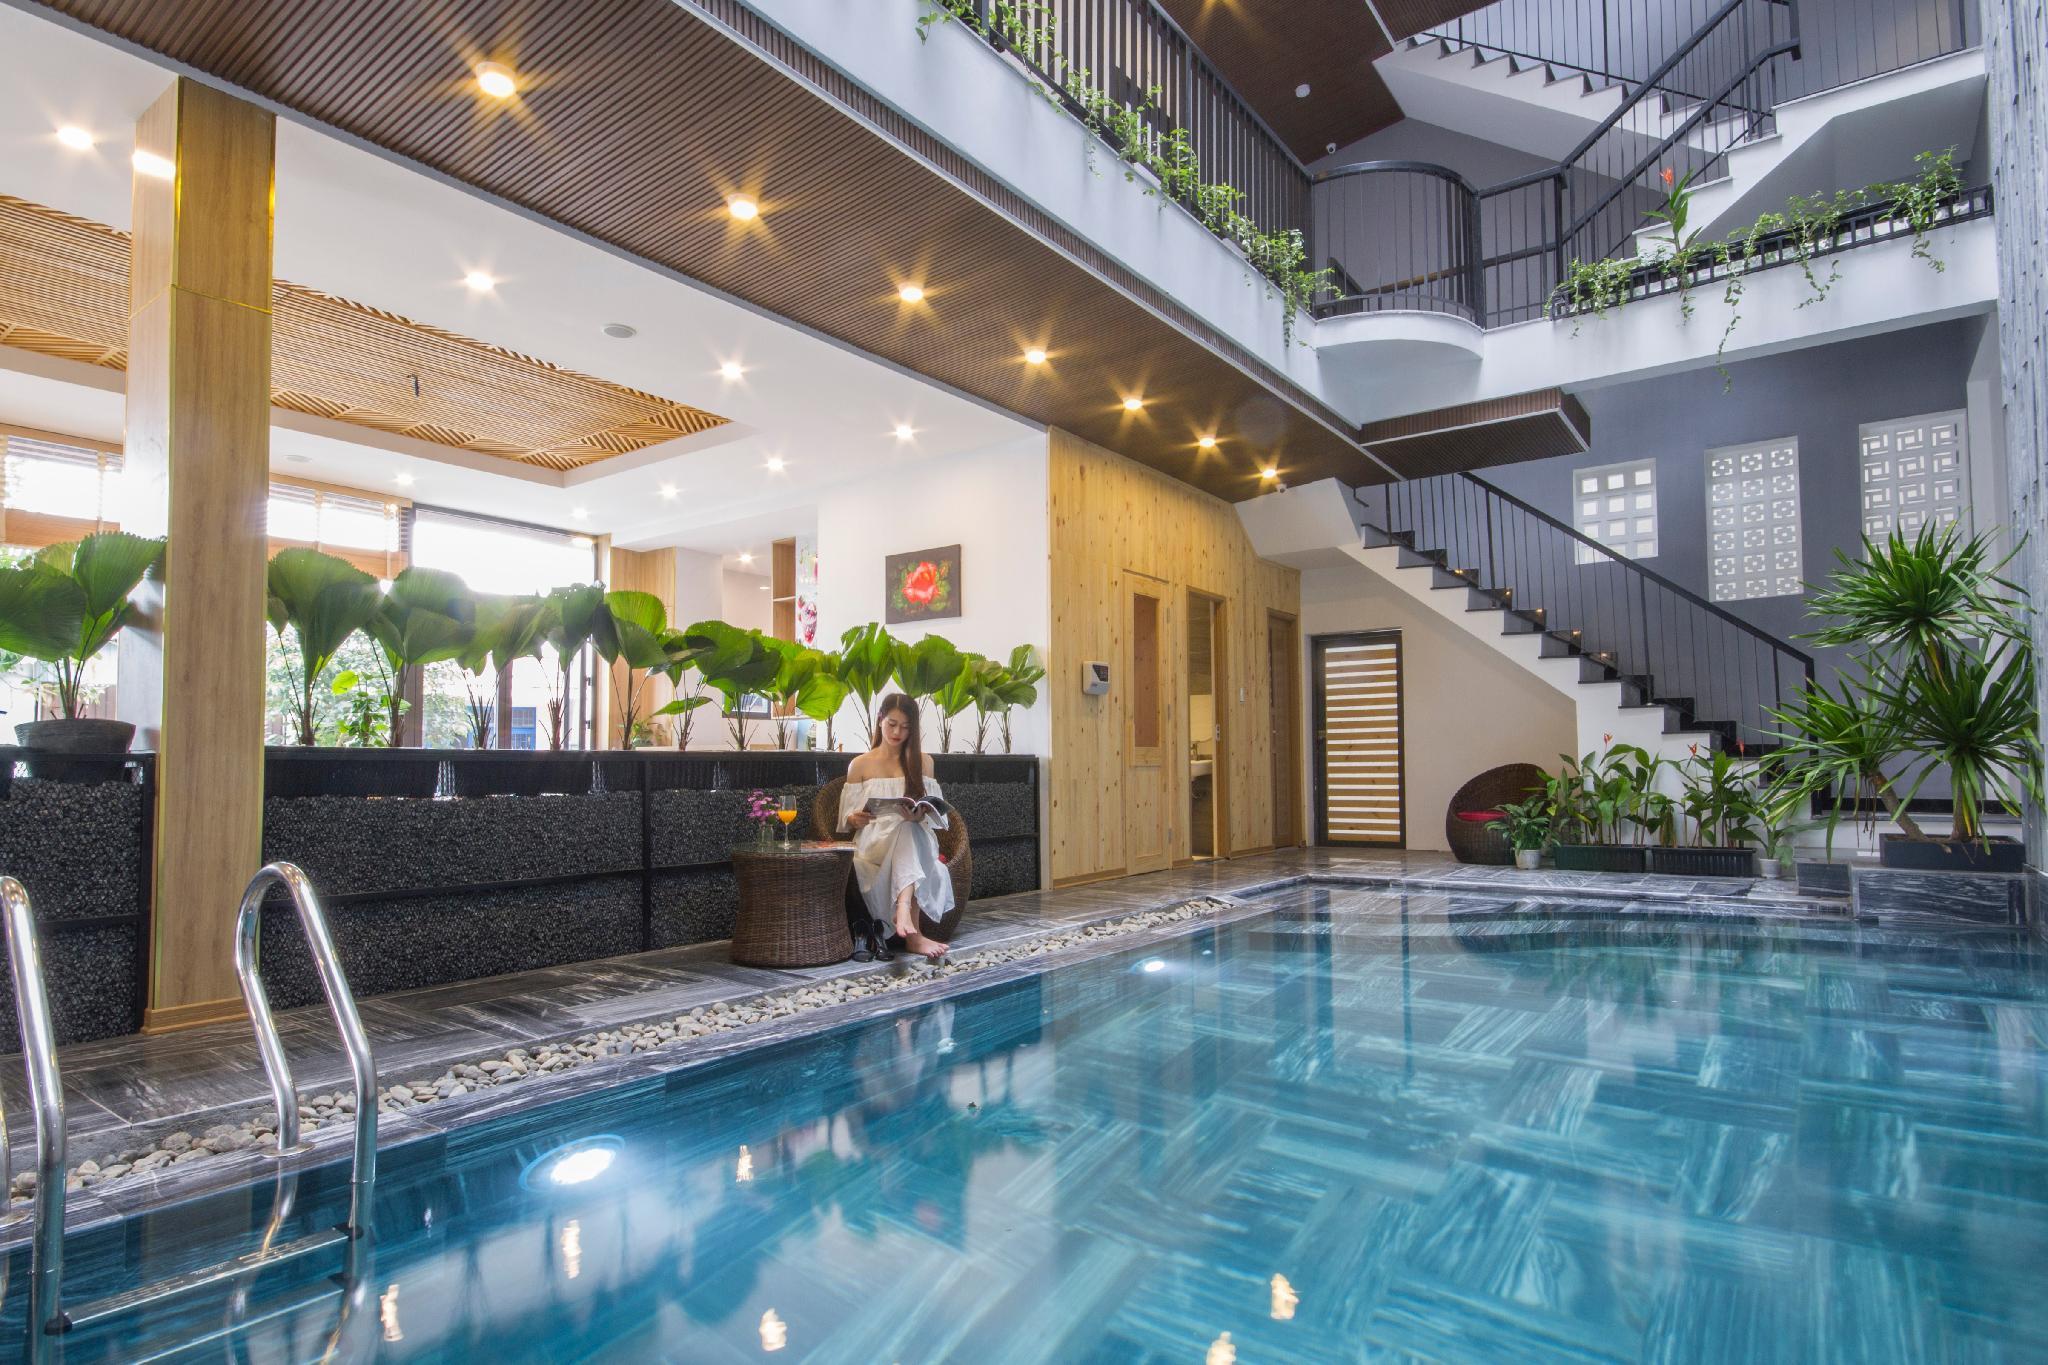 King House Villa Hotel And Spa